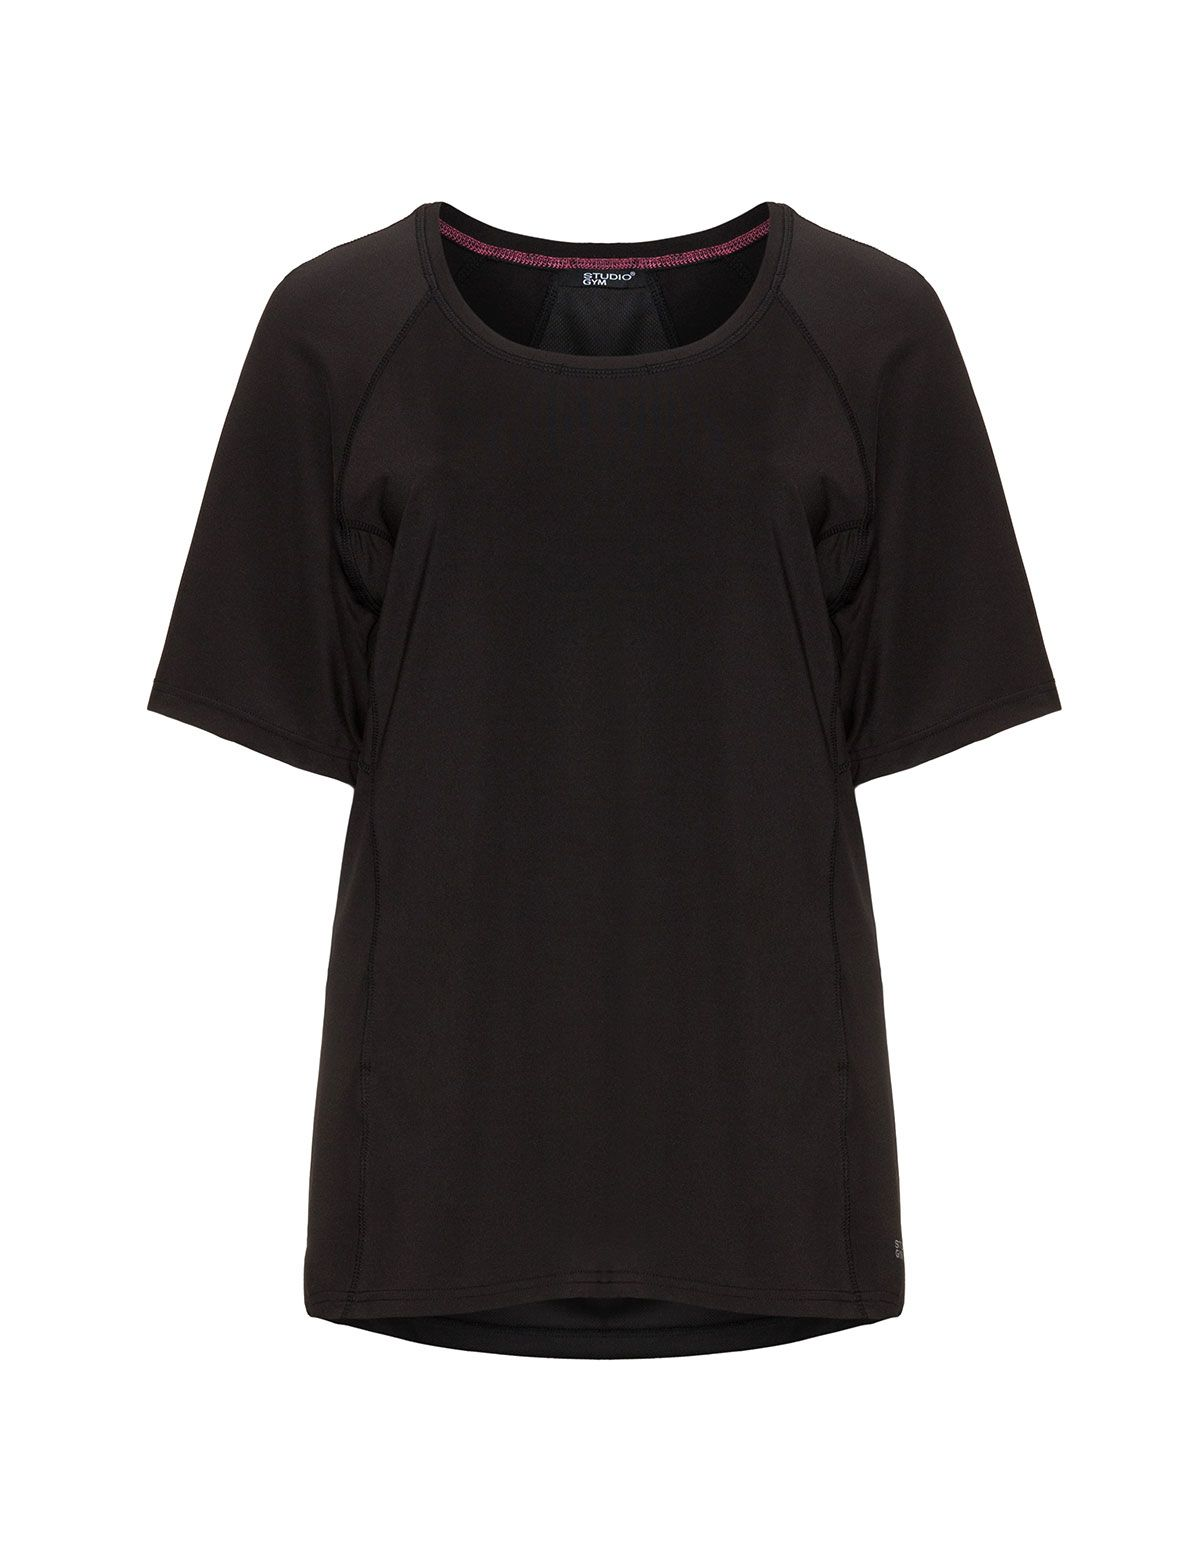 online store a1f9d 2a45e Studio Funktions-T-Shirt in Schwarz | 6 Dresses ...